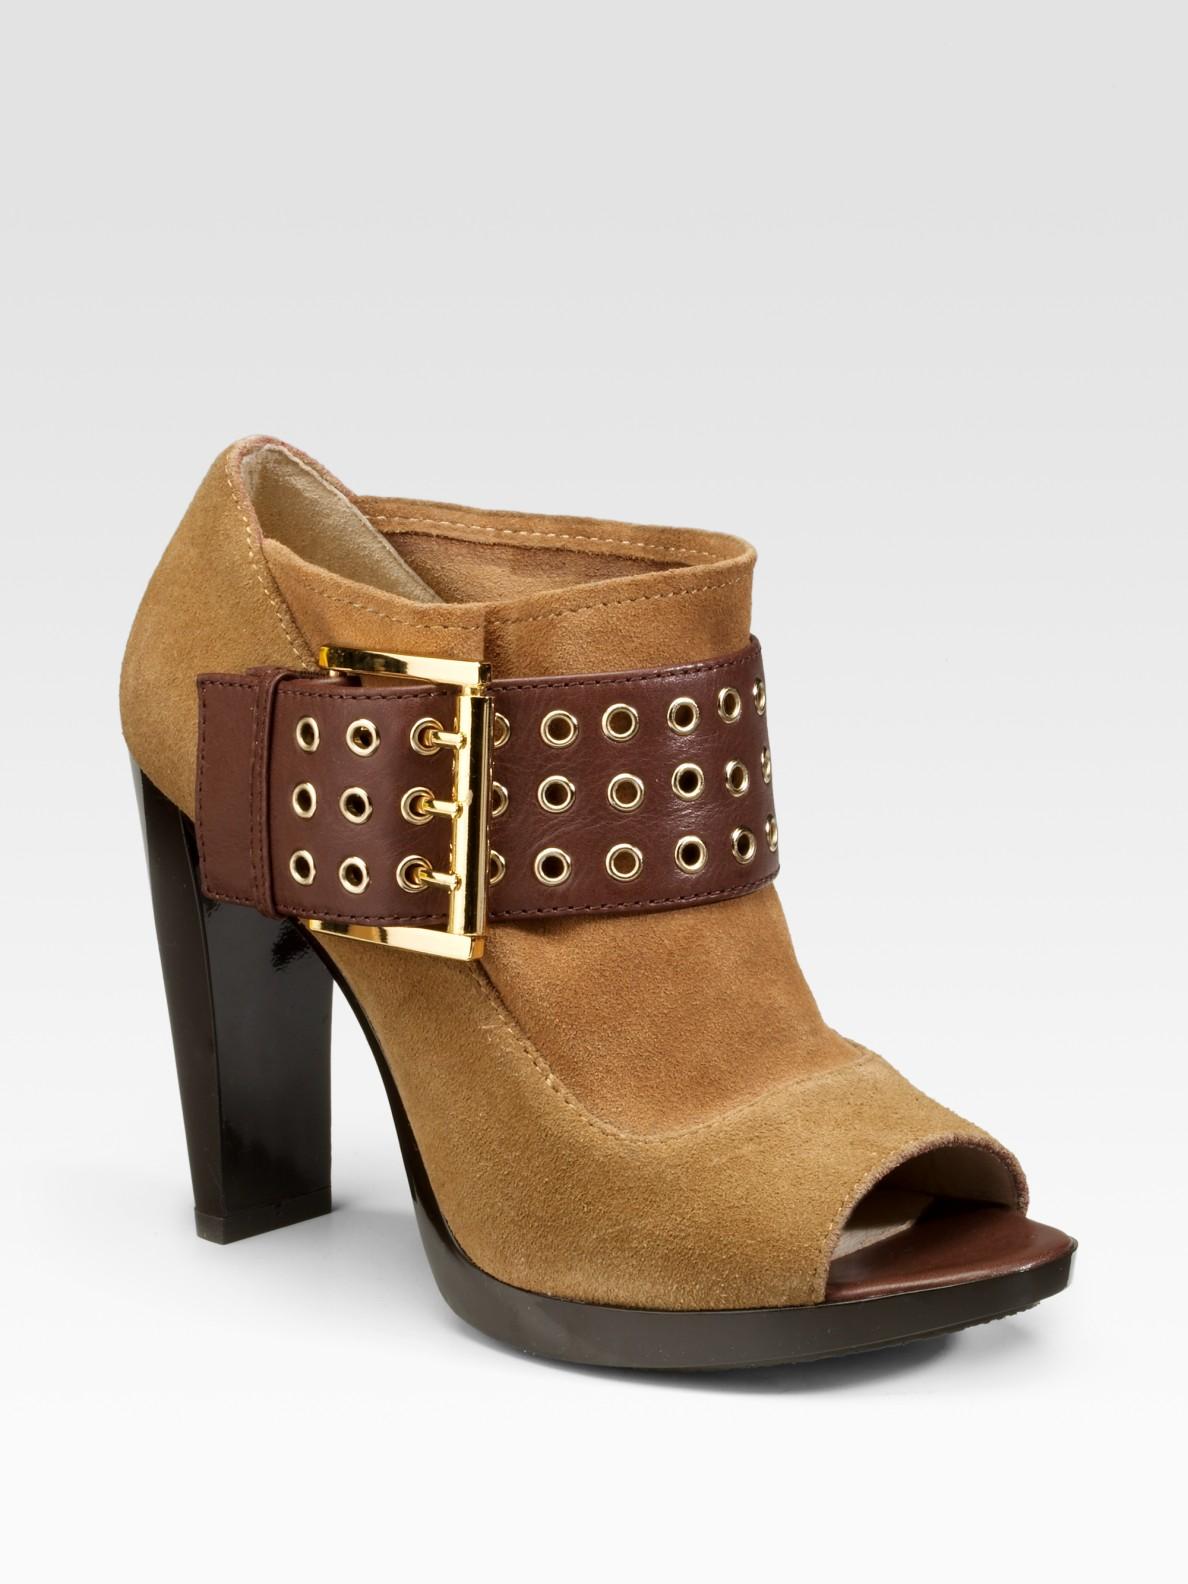 Michael Michael Kors Peep Toe Ankle Boots In Brown Tan